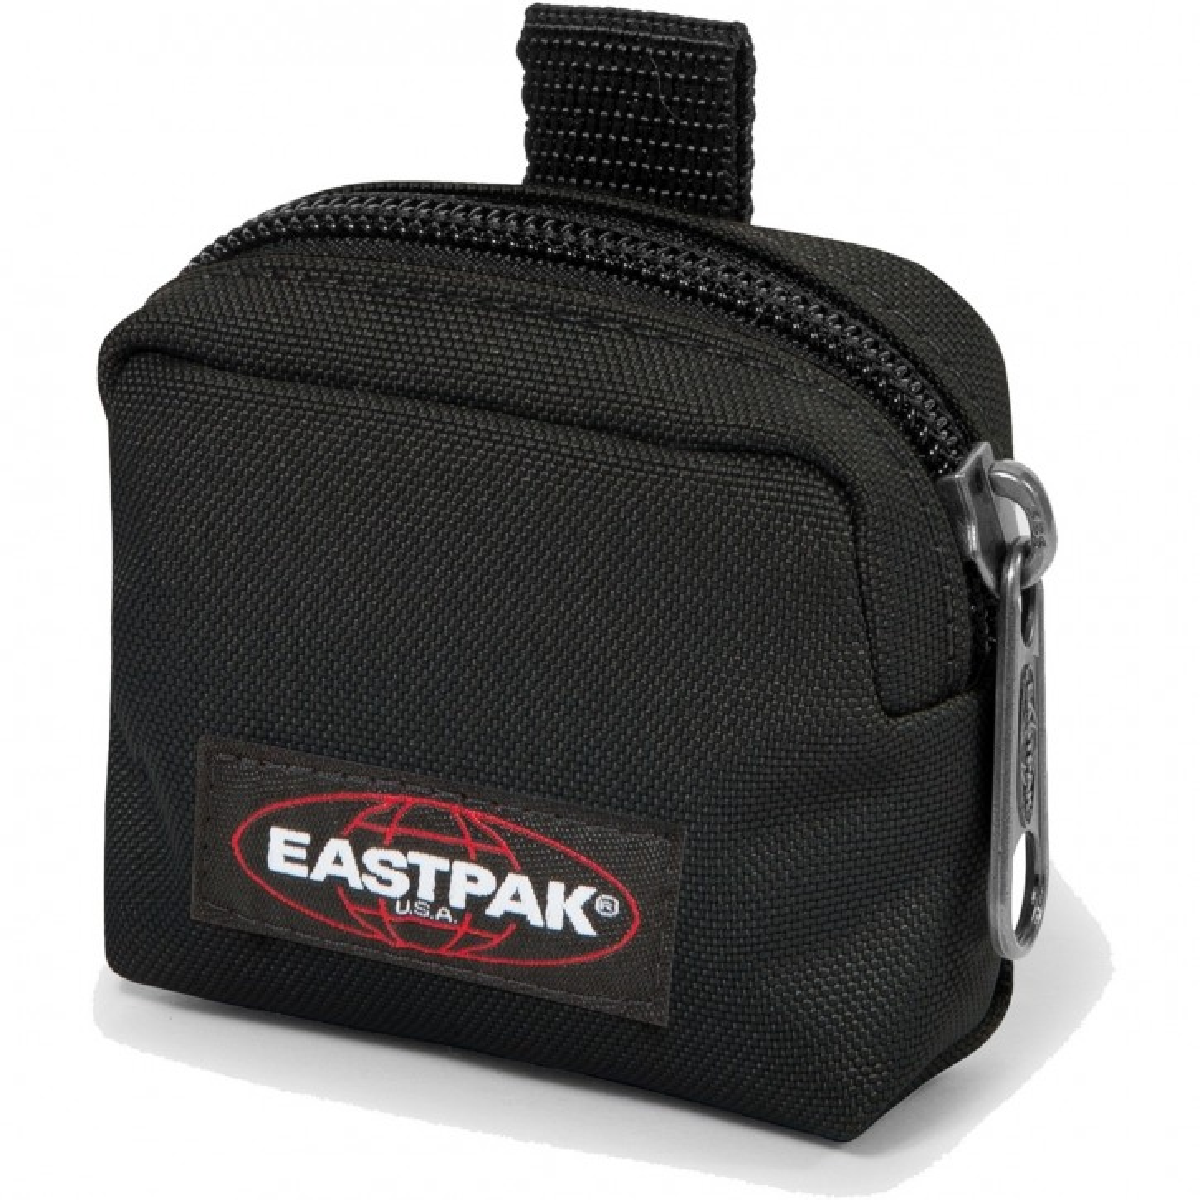 Eastpak Schlüsselanhänger-Bag »Stalker« Black Schwarz